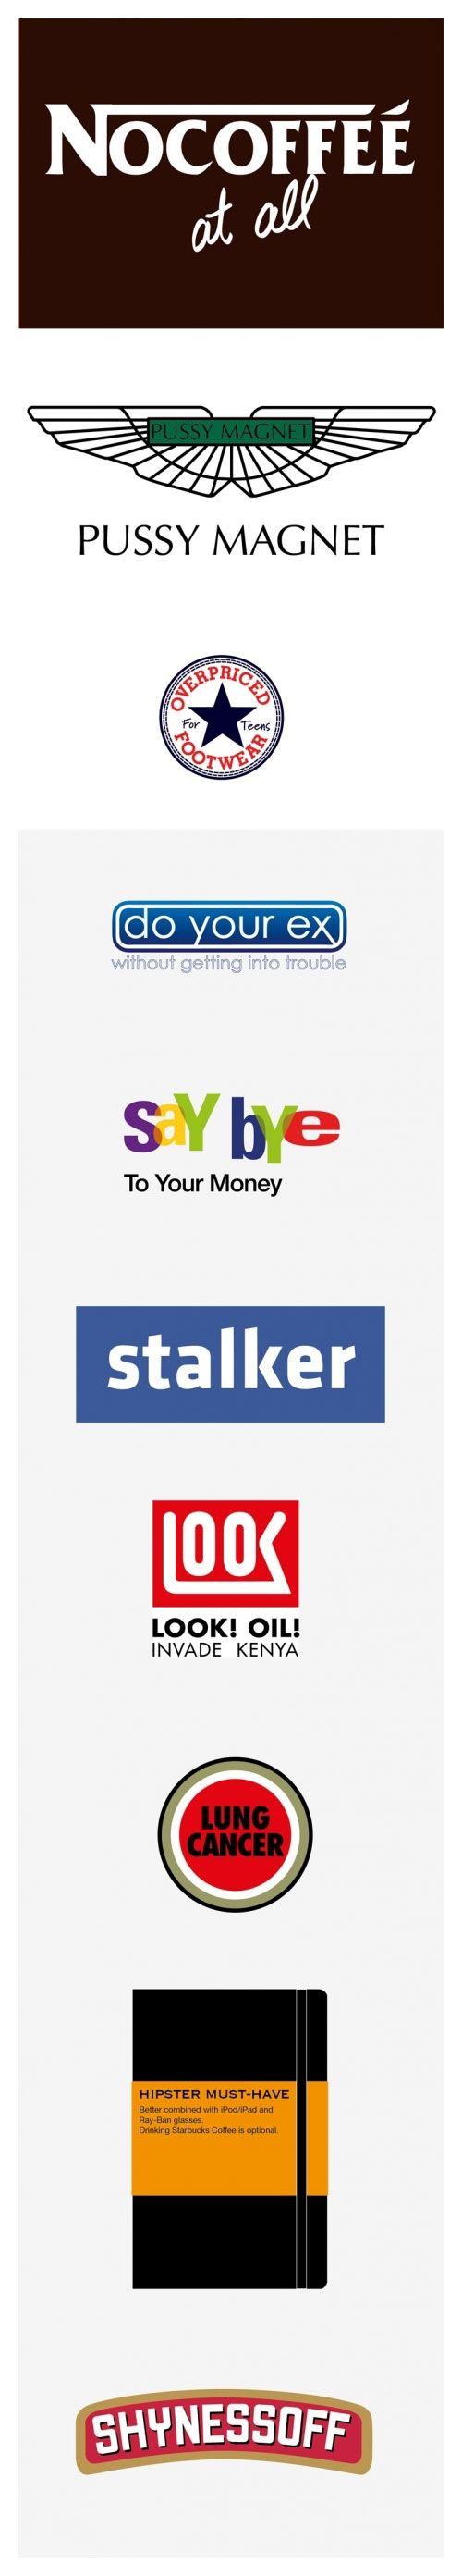 truthful branding: Branding Humor, Pin Today, Website, Graphics Design, True Logos, Funny Stuff, Random Pin, Pictures Today, Design Stuff